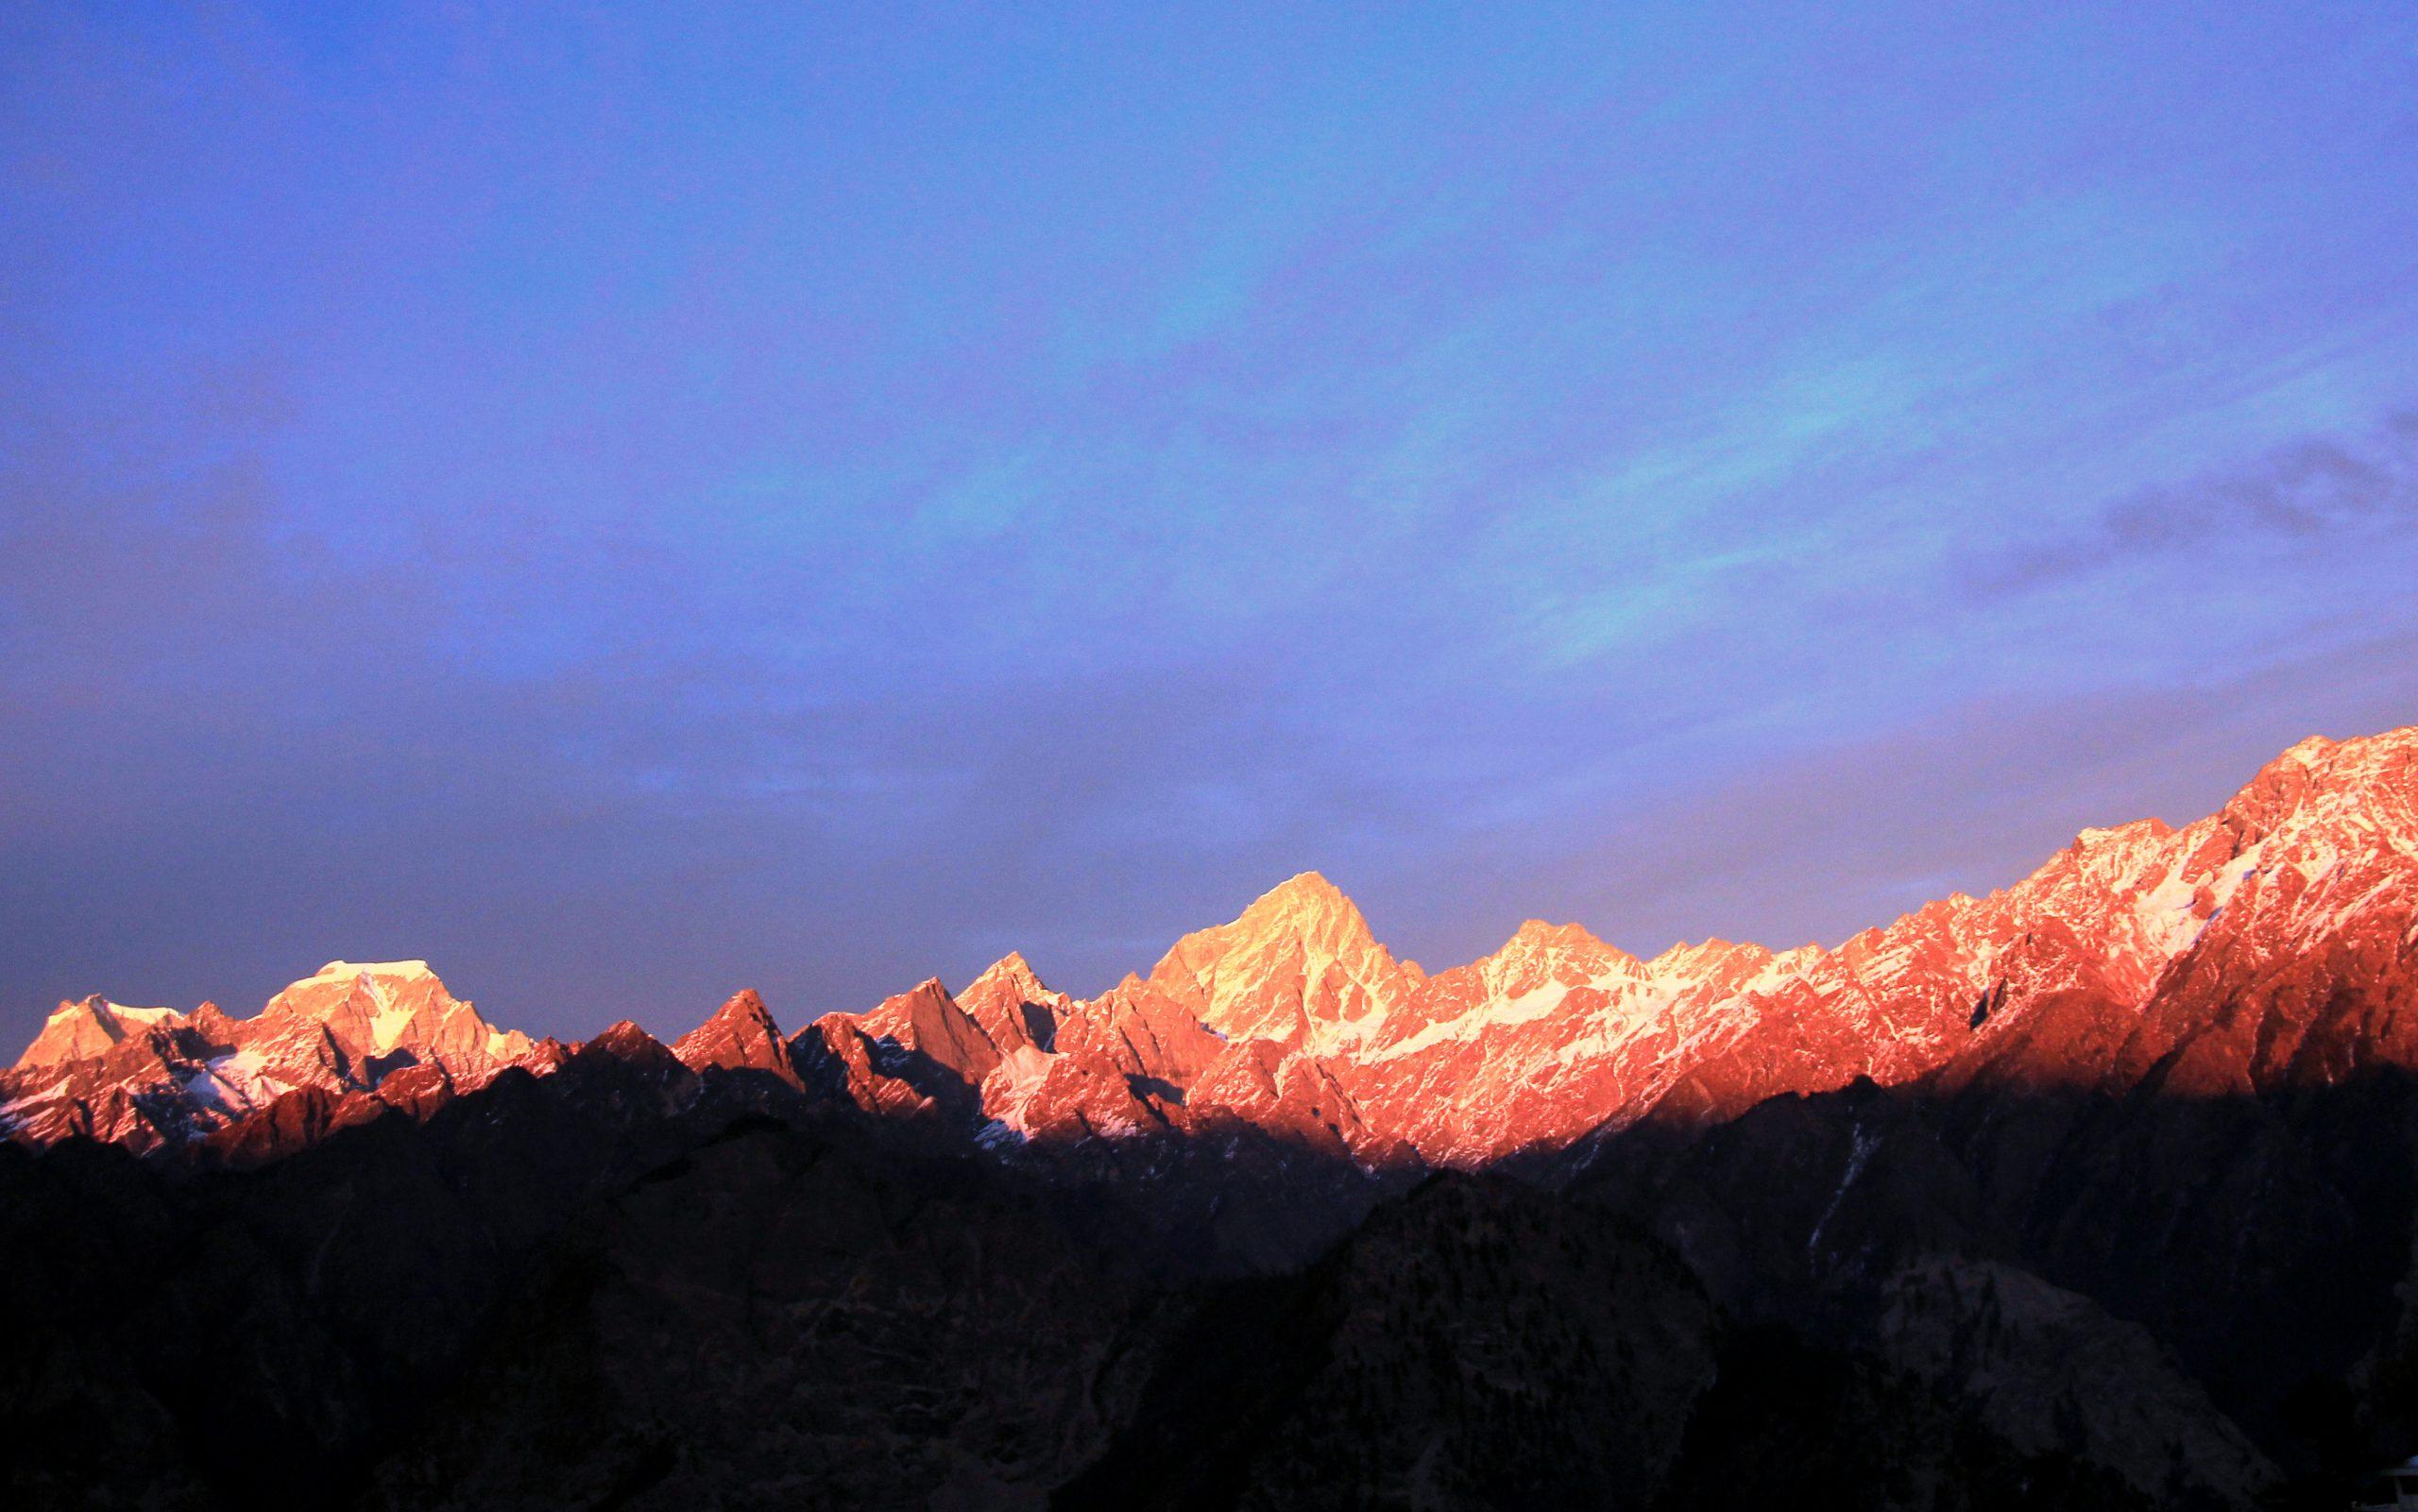 A Golden Peaks Photo of Dzongri